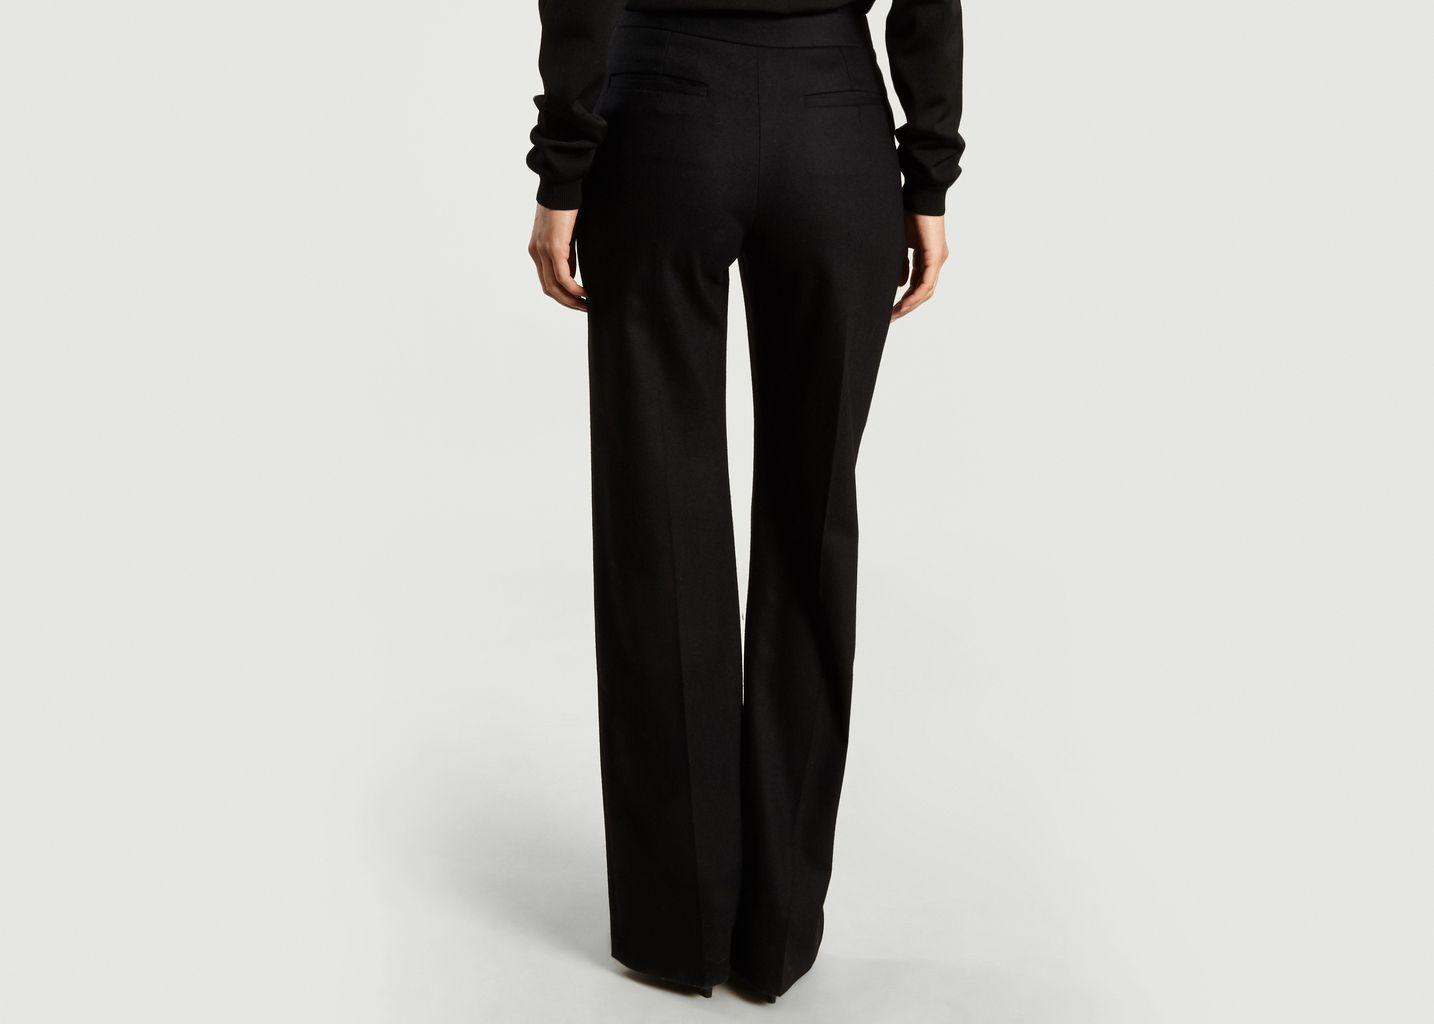 Pantalon Droit Jambe Large - Cacharel